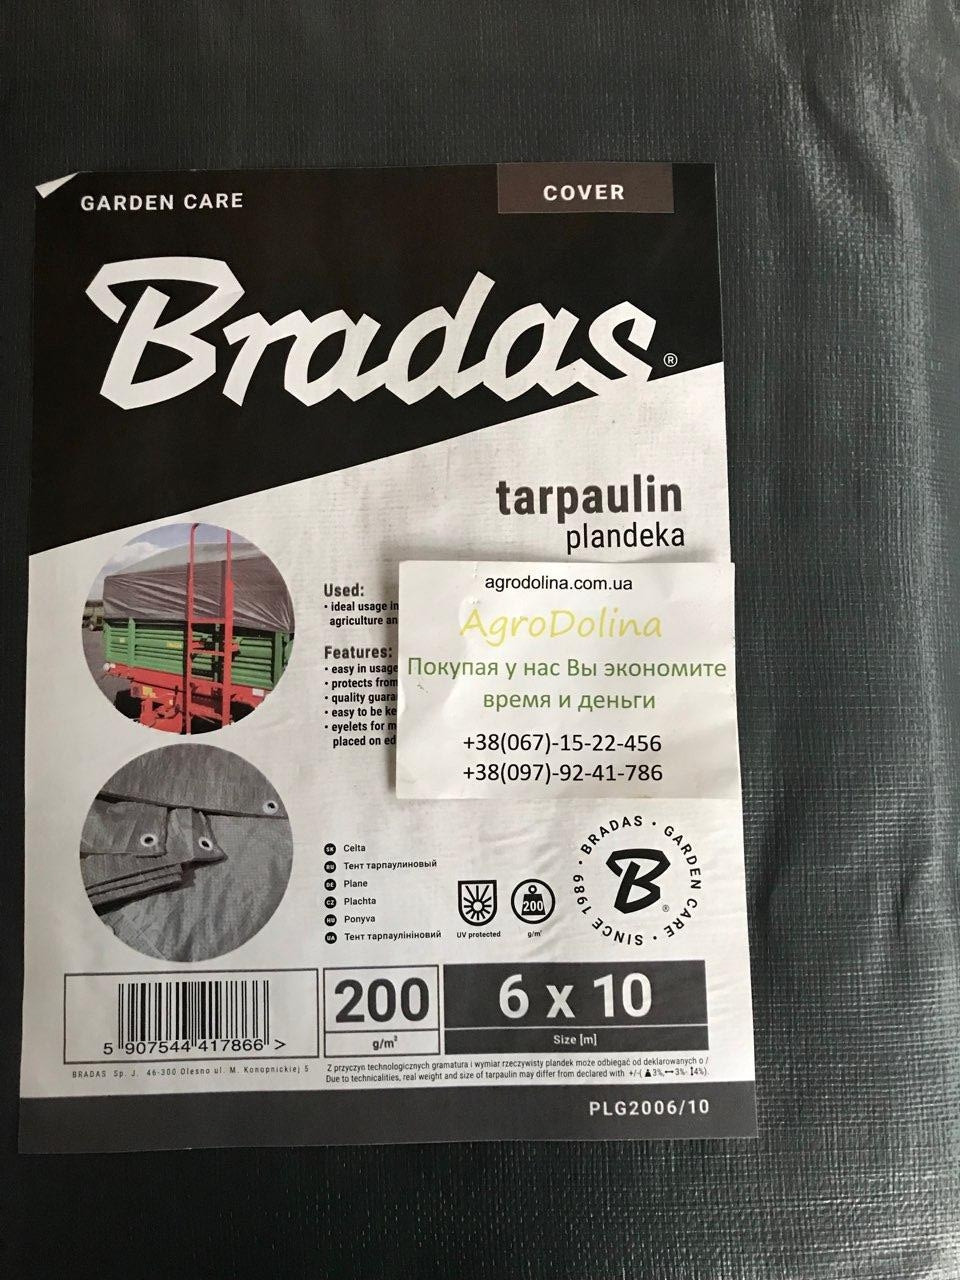 Тент Bradas темно-серый тарпаулин  200 гр/м², размер 3х5м